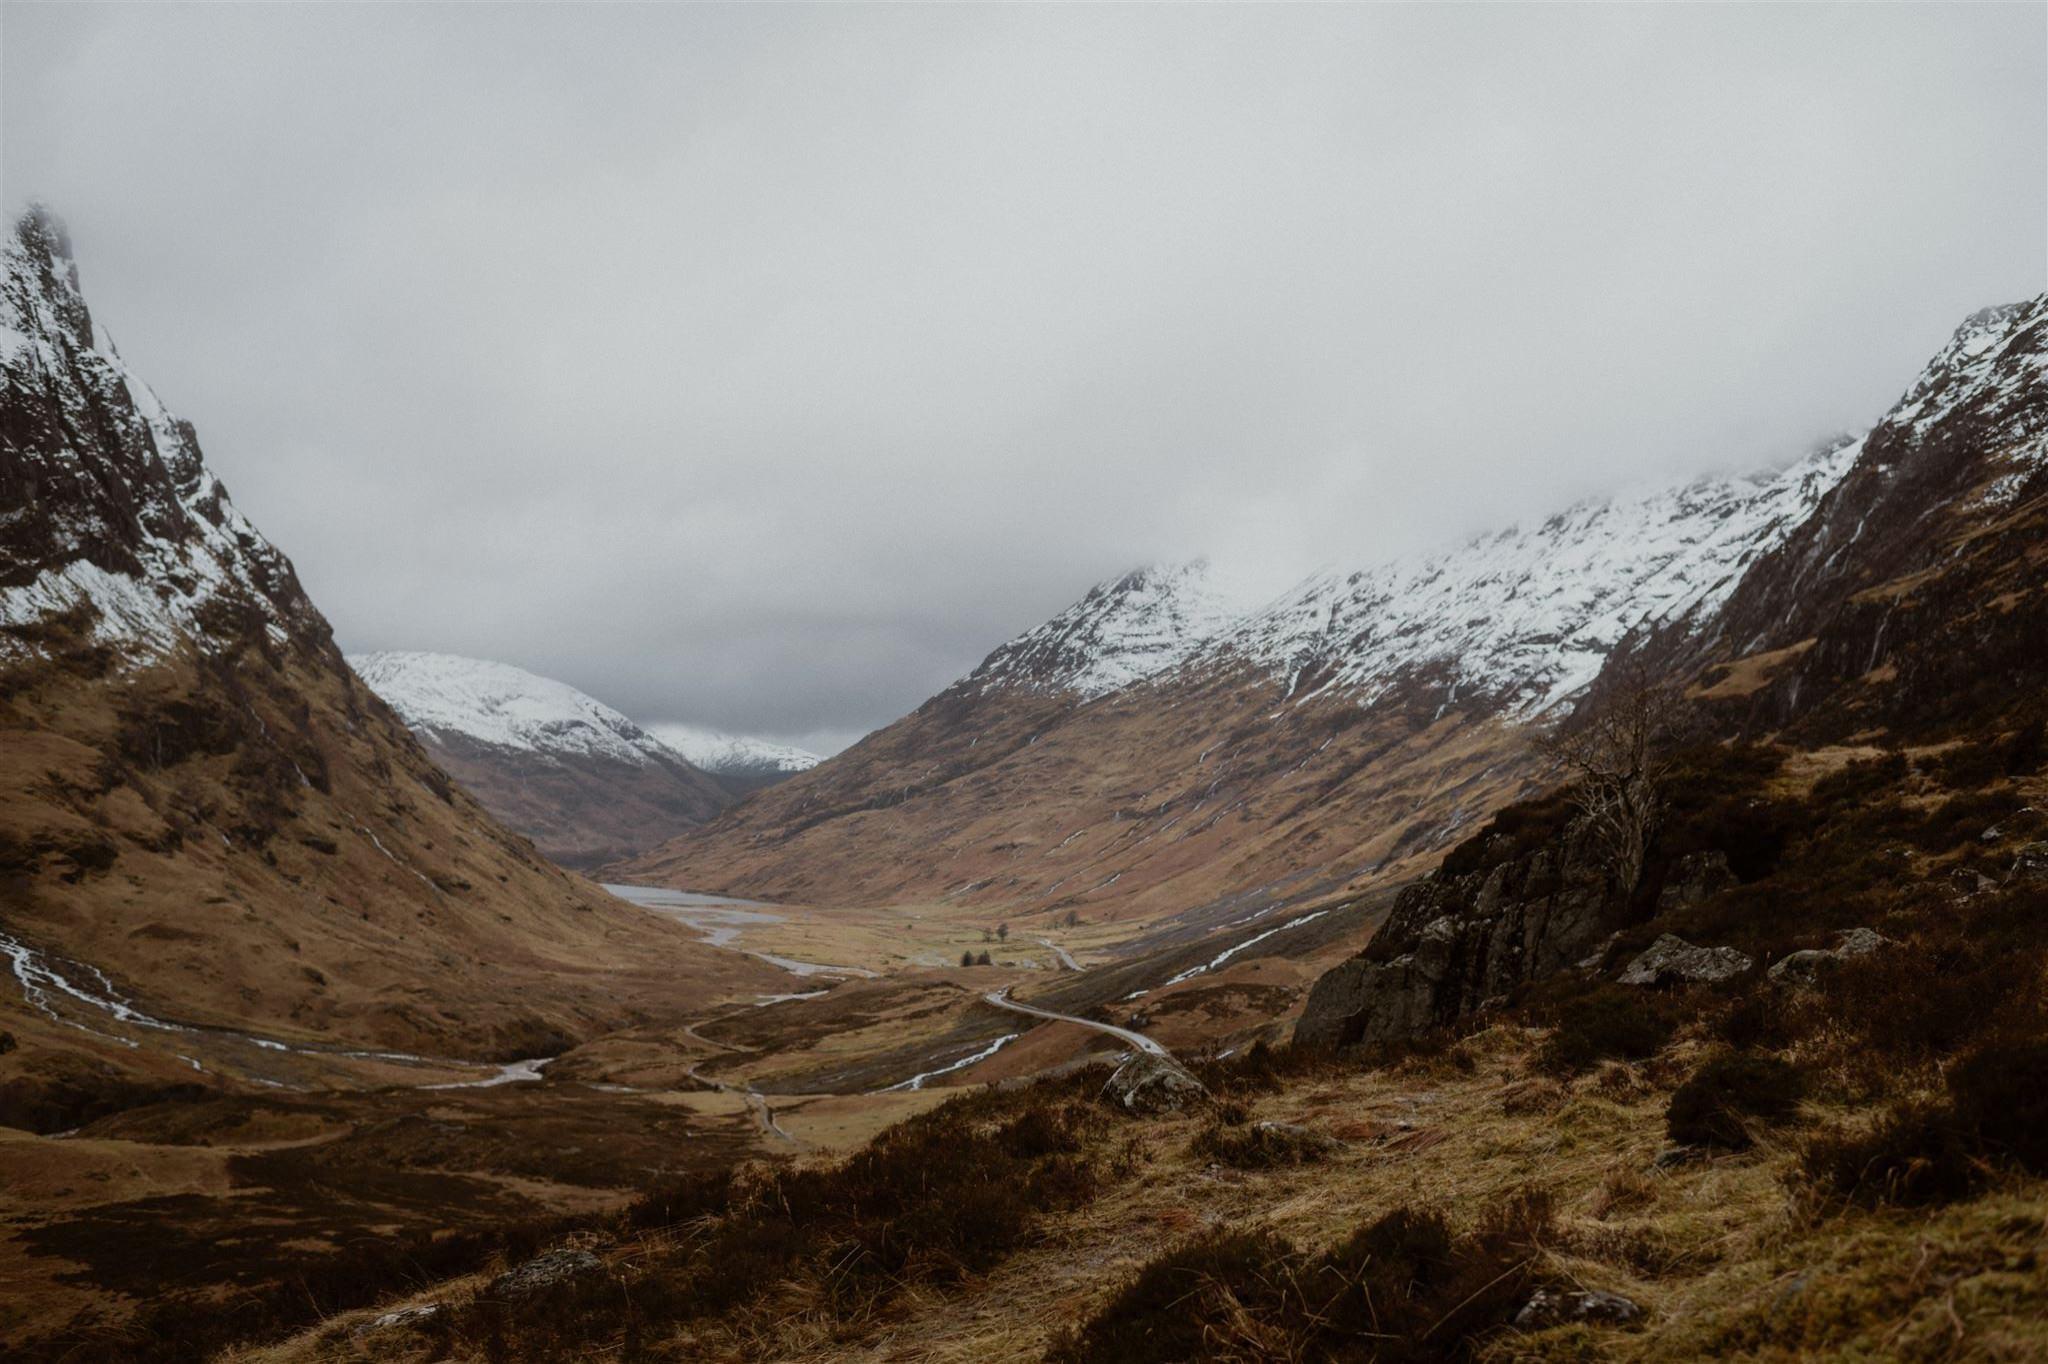 Glencoe Valley mountain landscape in the Scottish Highlands